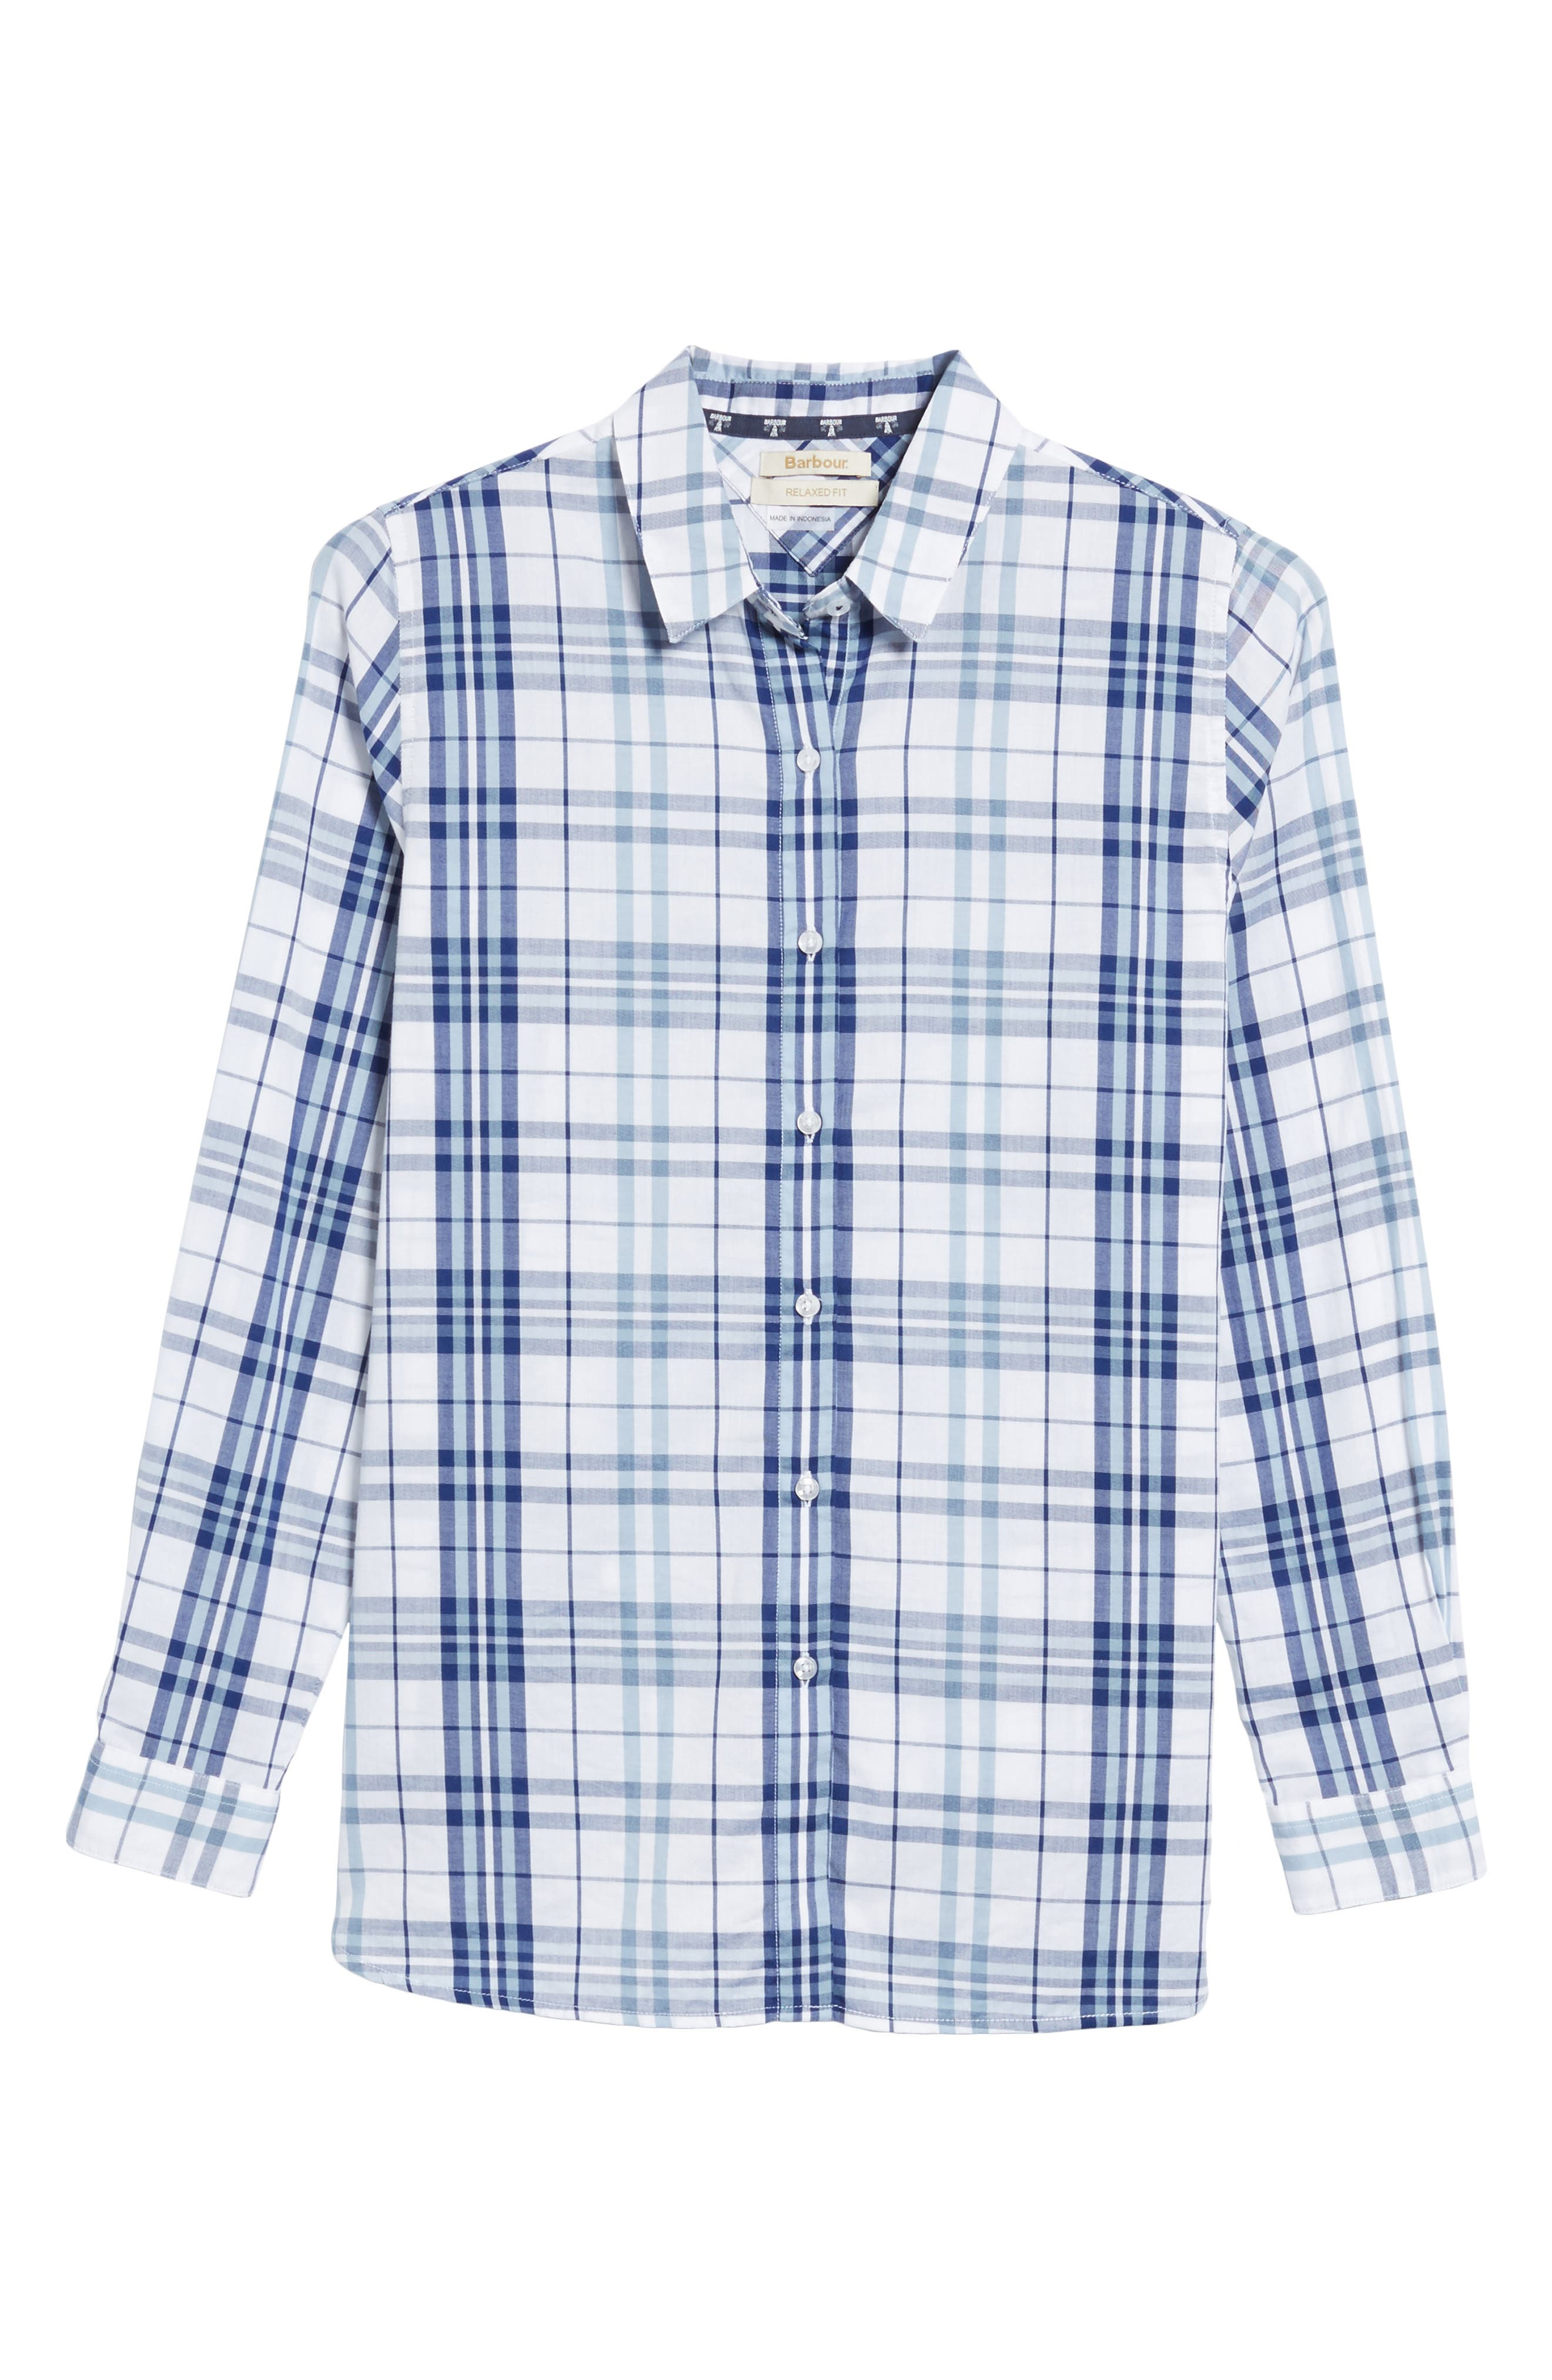 Selsey Plaid Shirt,                             Alternate thumbnail 6, color,                             White/ Coastal Blue